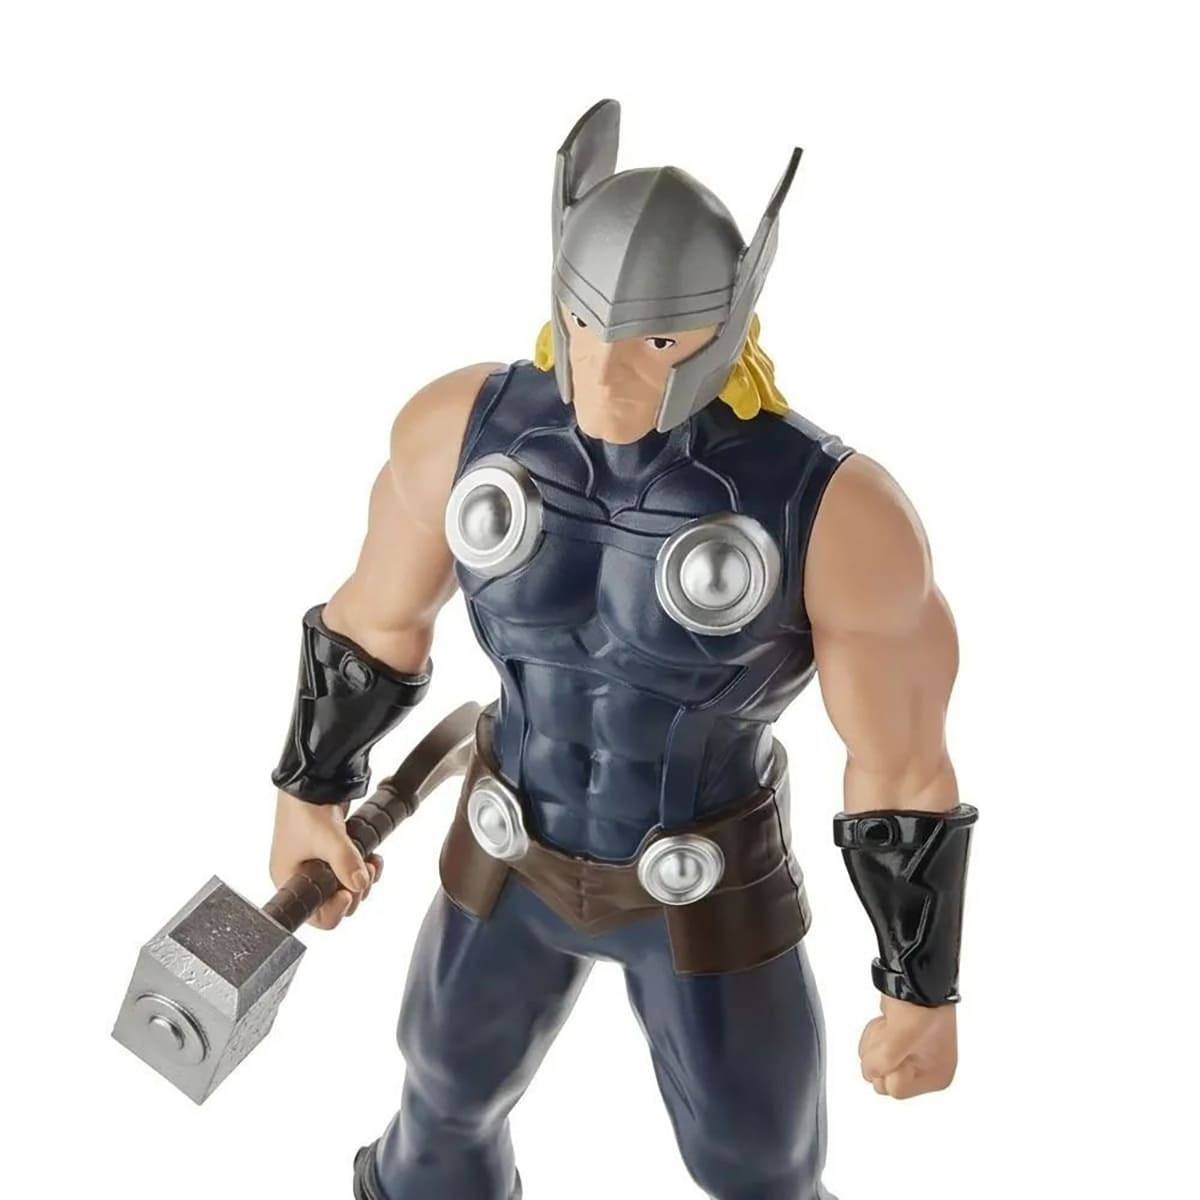 Boneco Thor Vingadores Marvel Brinquedo colecionavel Hasbro